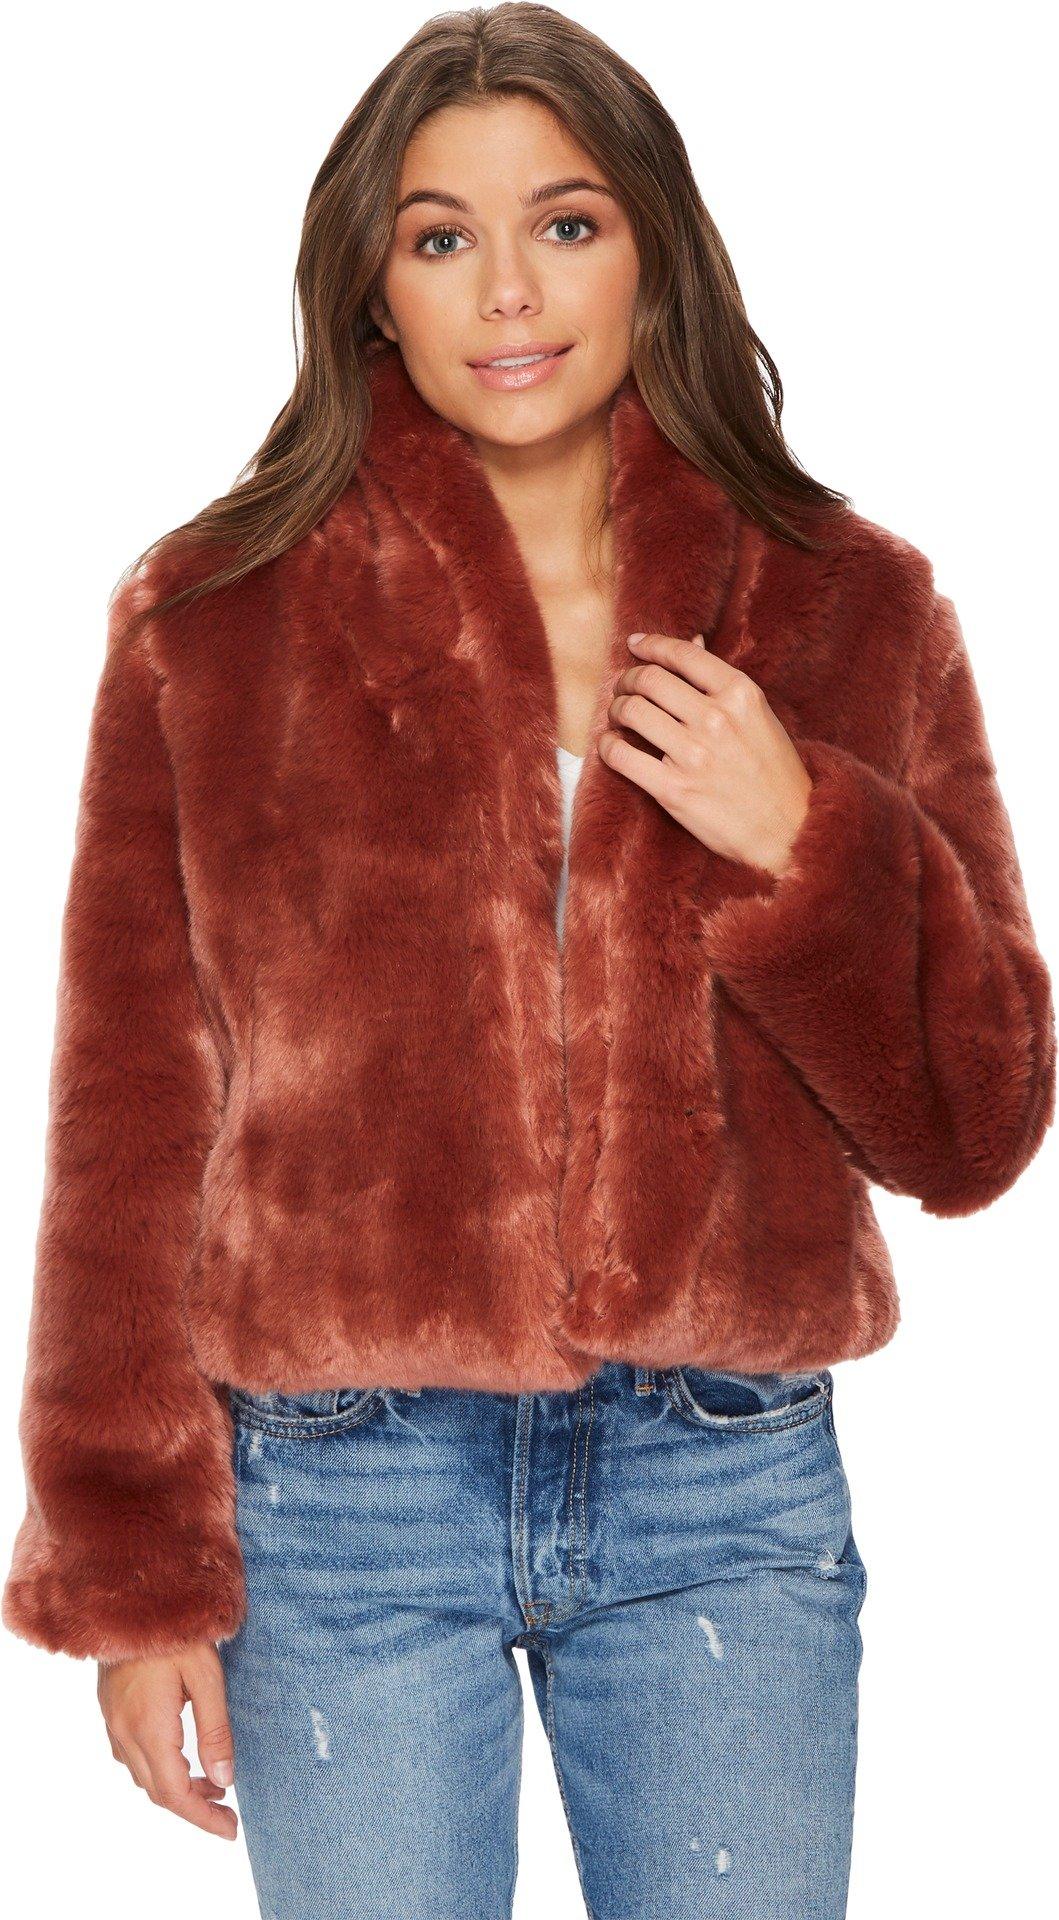 Obey Women's Lana Fur Coat Sangria X-Small